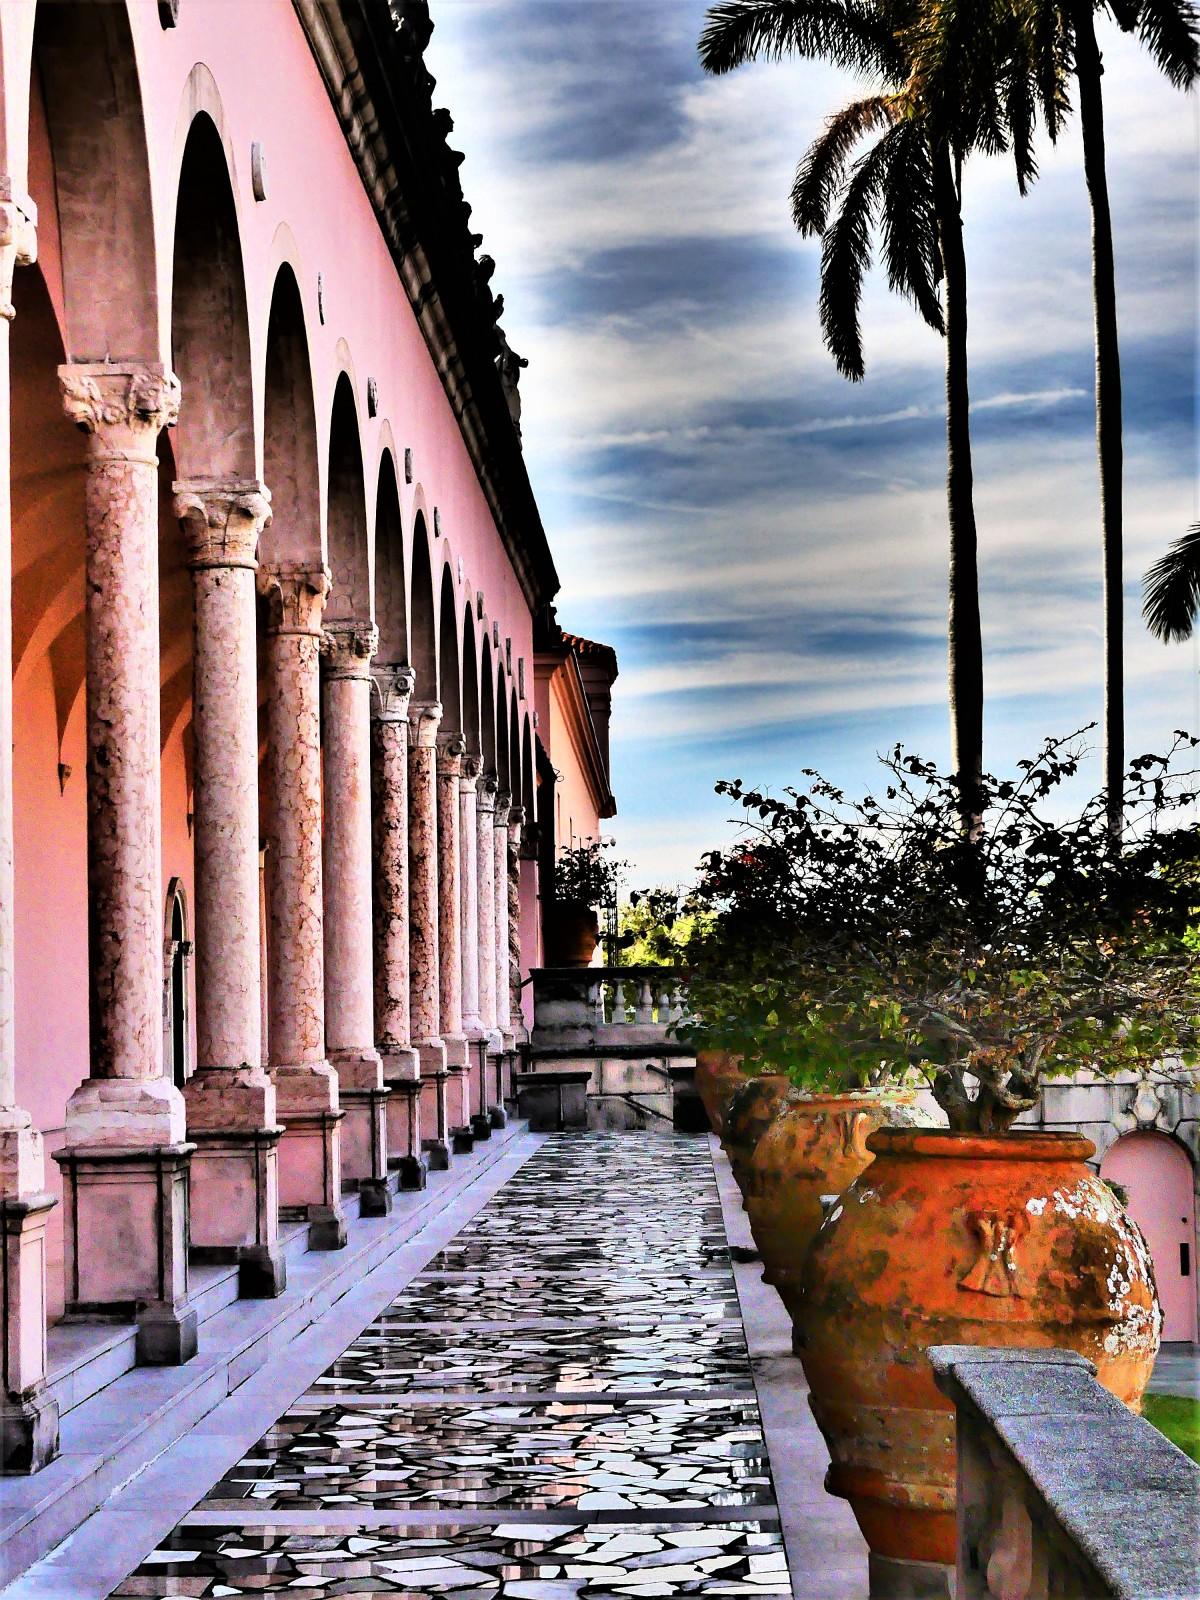 shimmering walkway